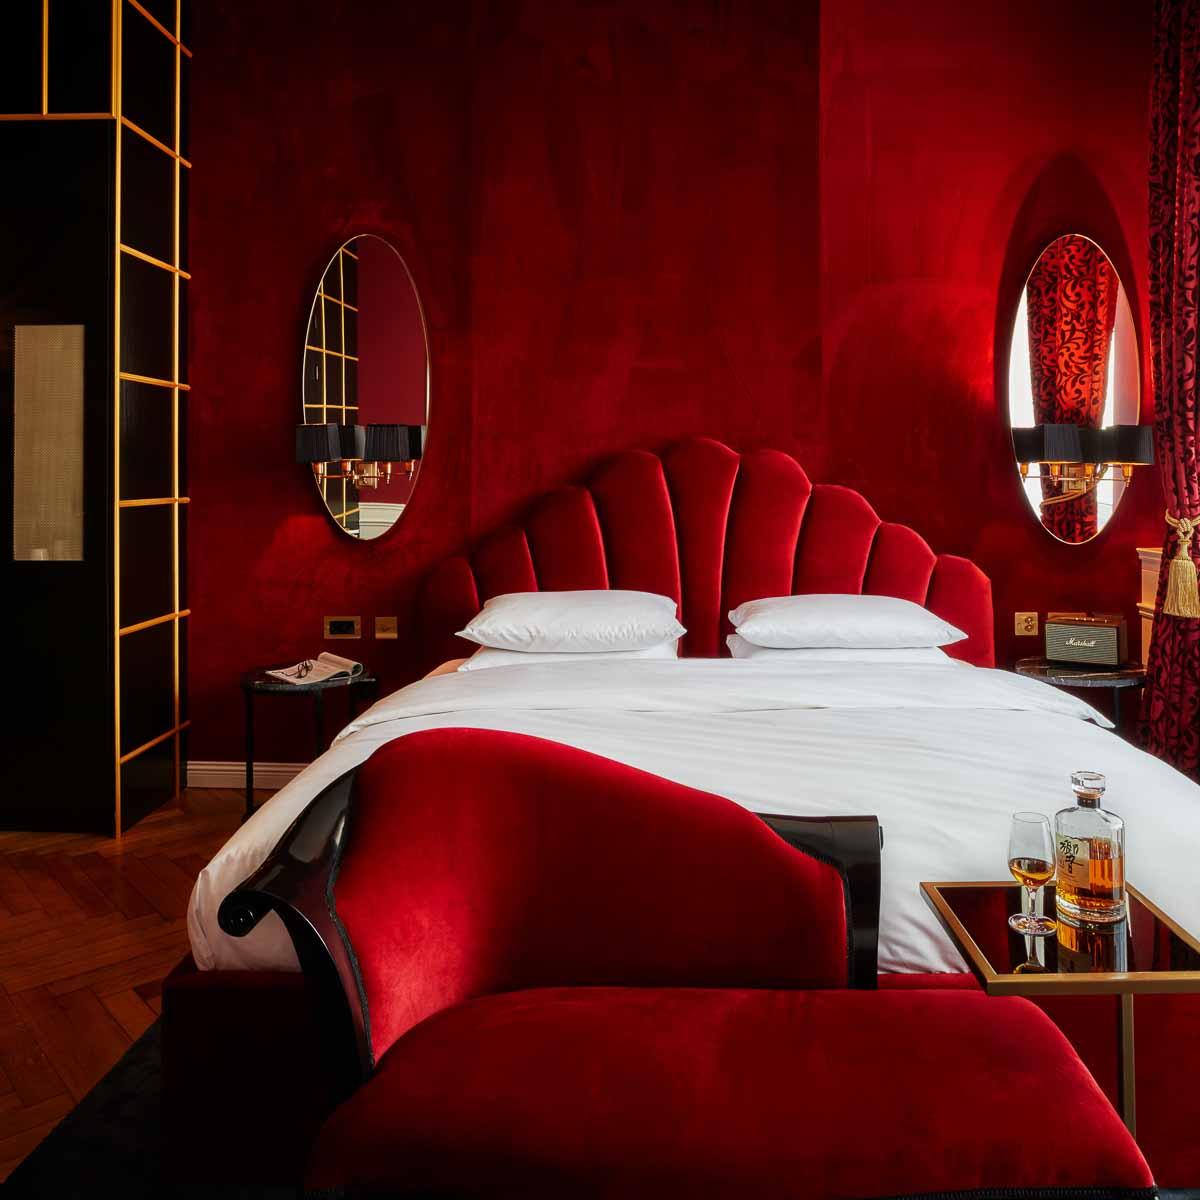 Hotel Provocateur Berlin Wilmersdorf Chrlottenburg-7